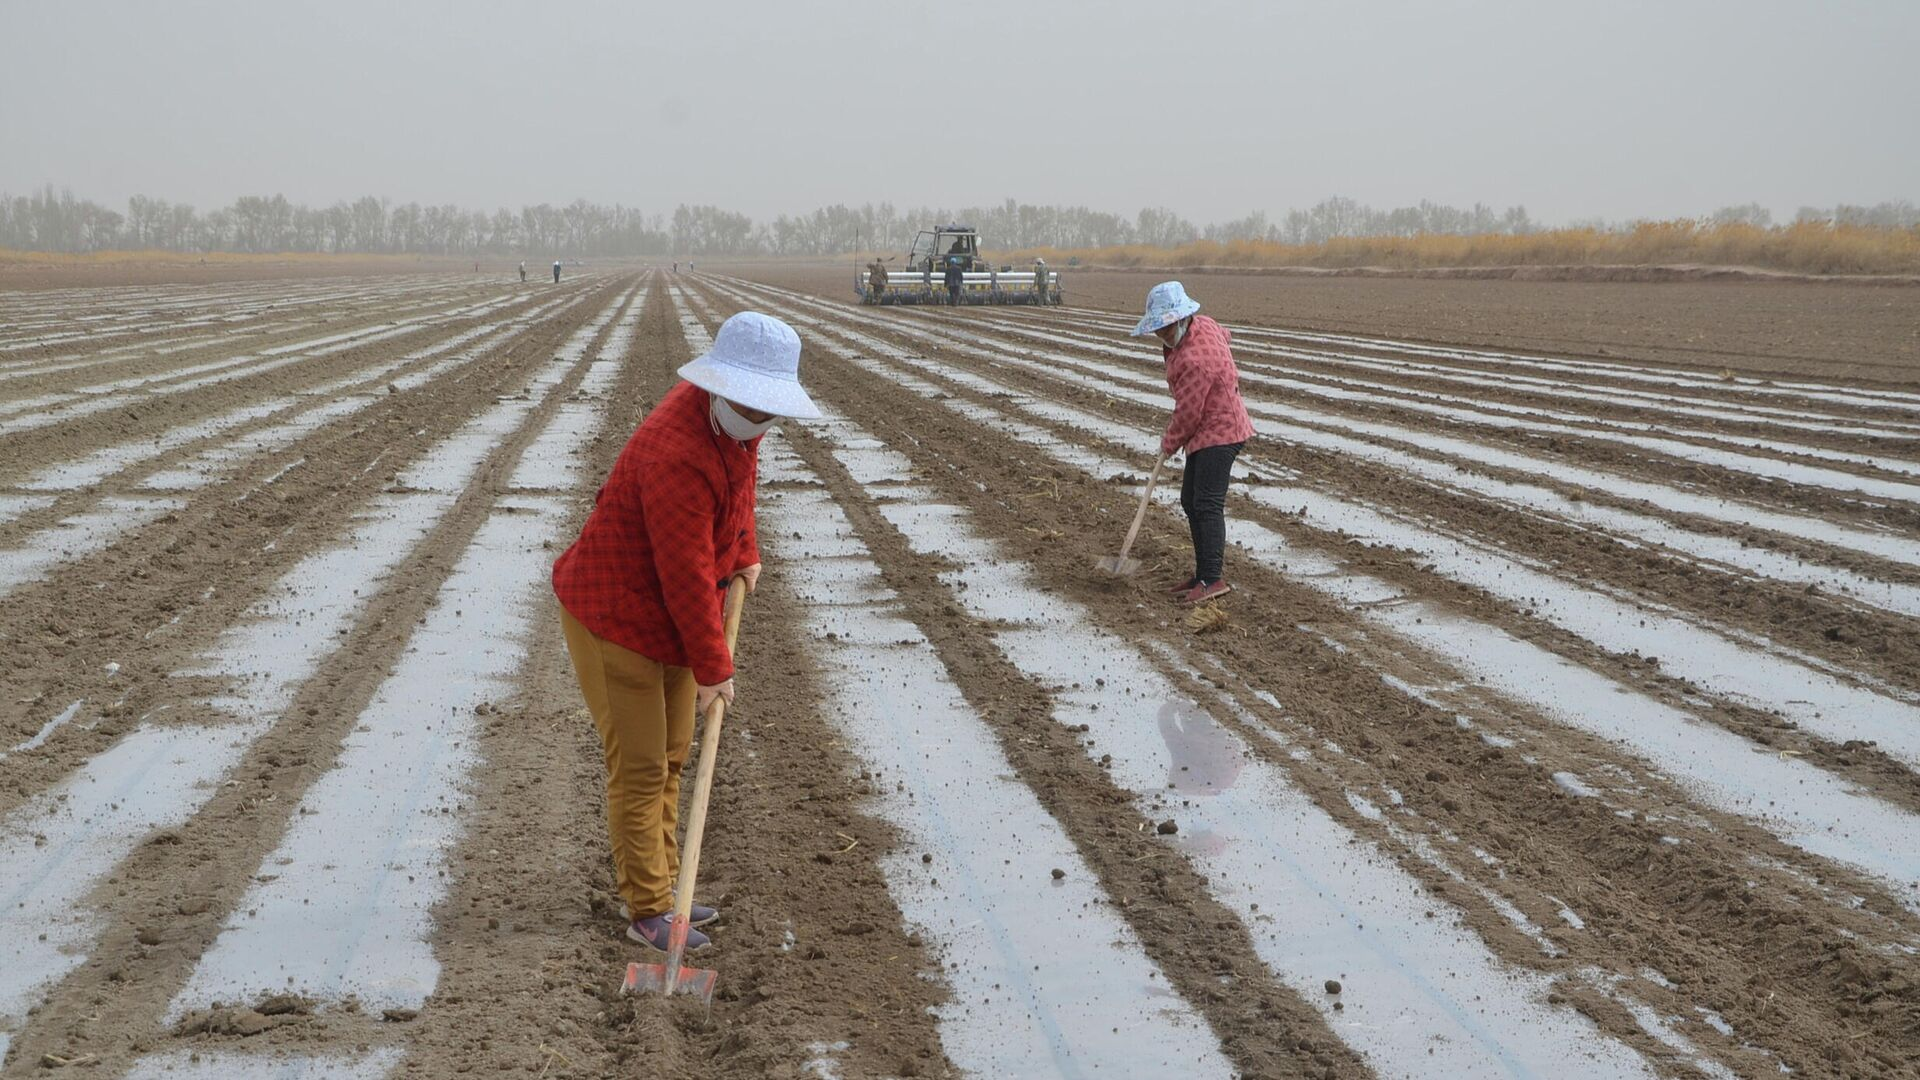 Un cultivo de algodón en Xinjiang - Sputnik Mundo, 1920, 29.03.2021